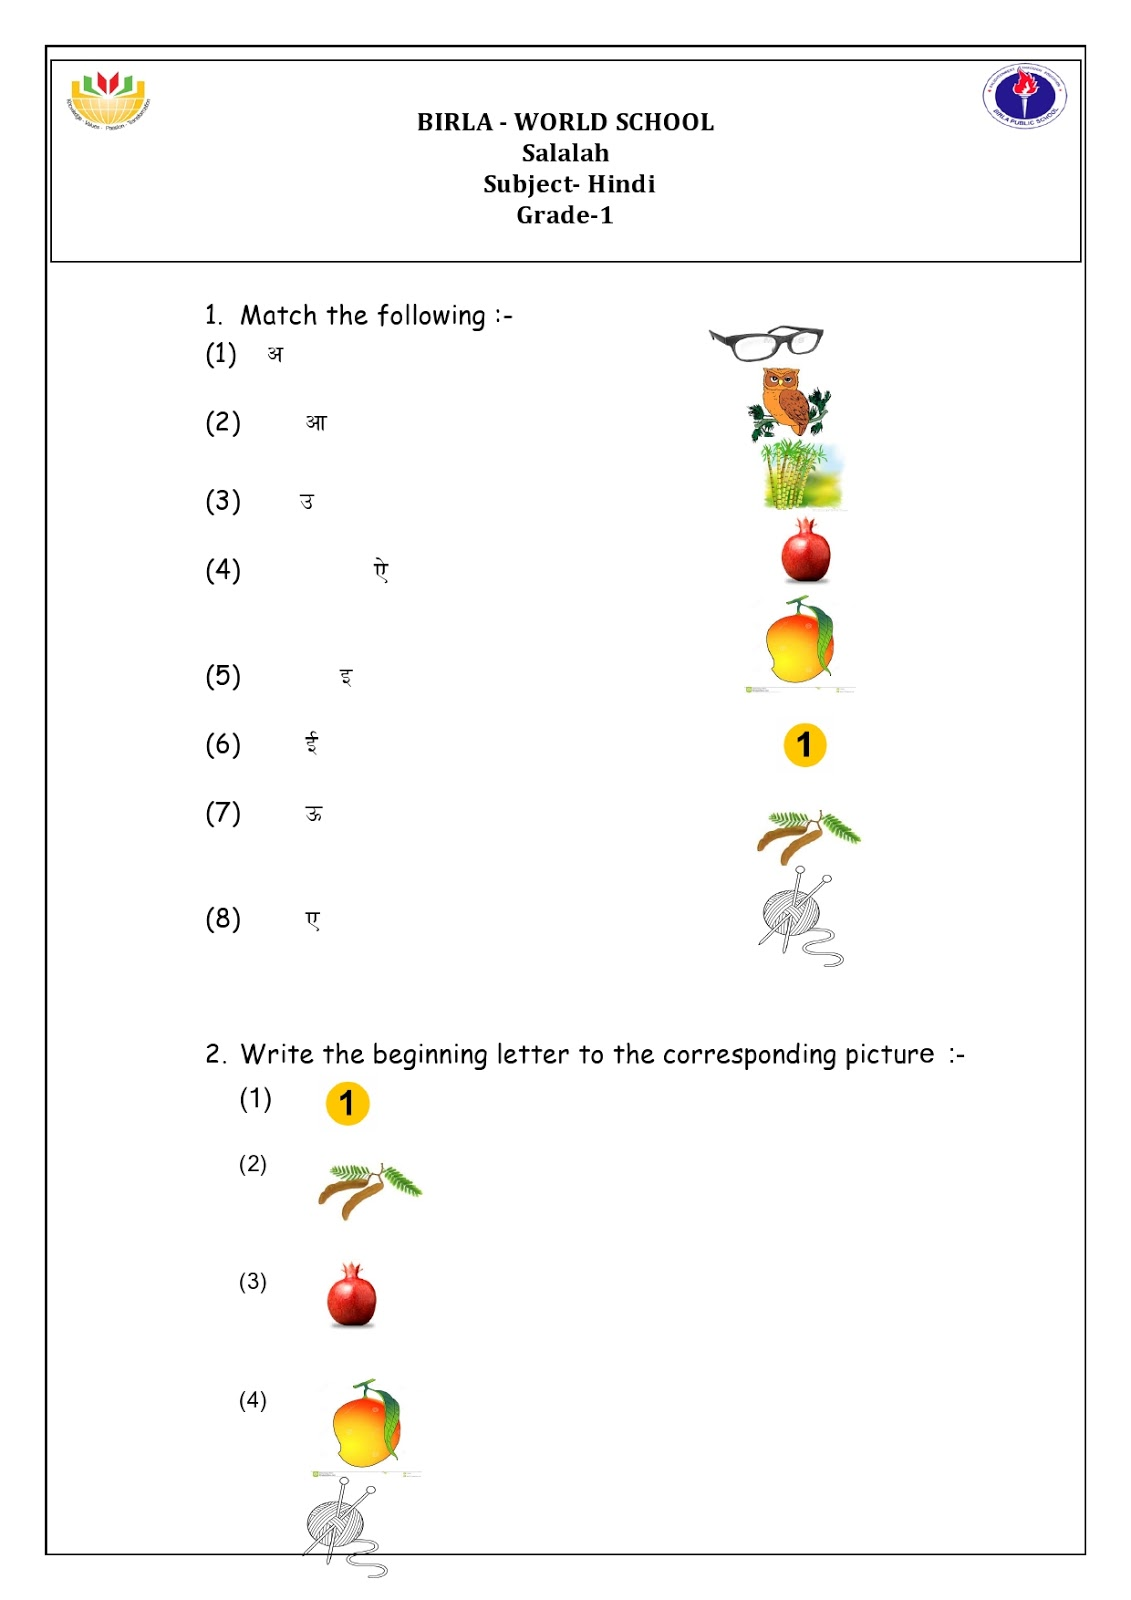 Birla World School Oman Homework For Grade 1 B And D On